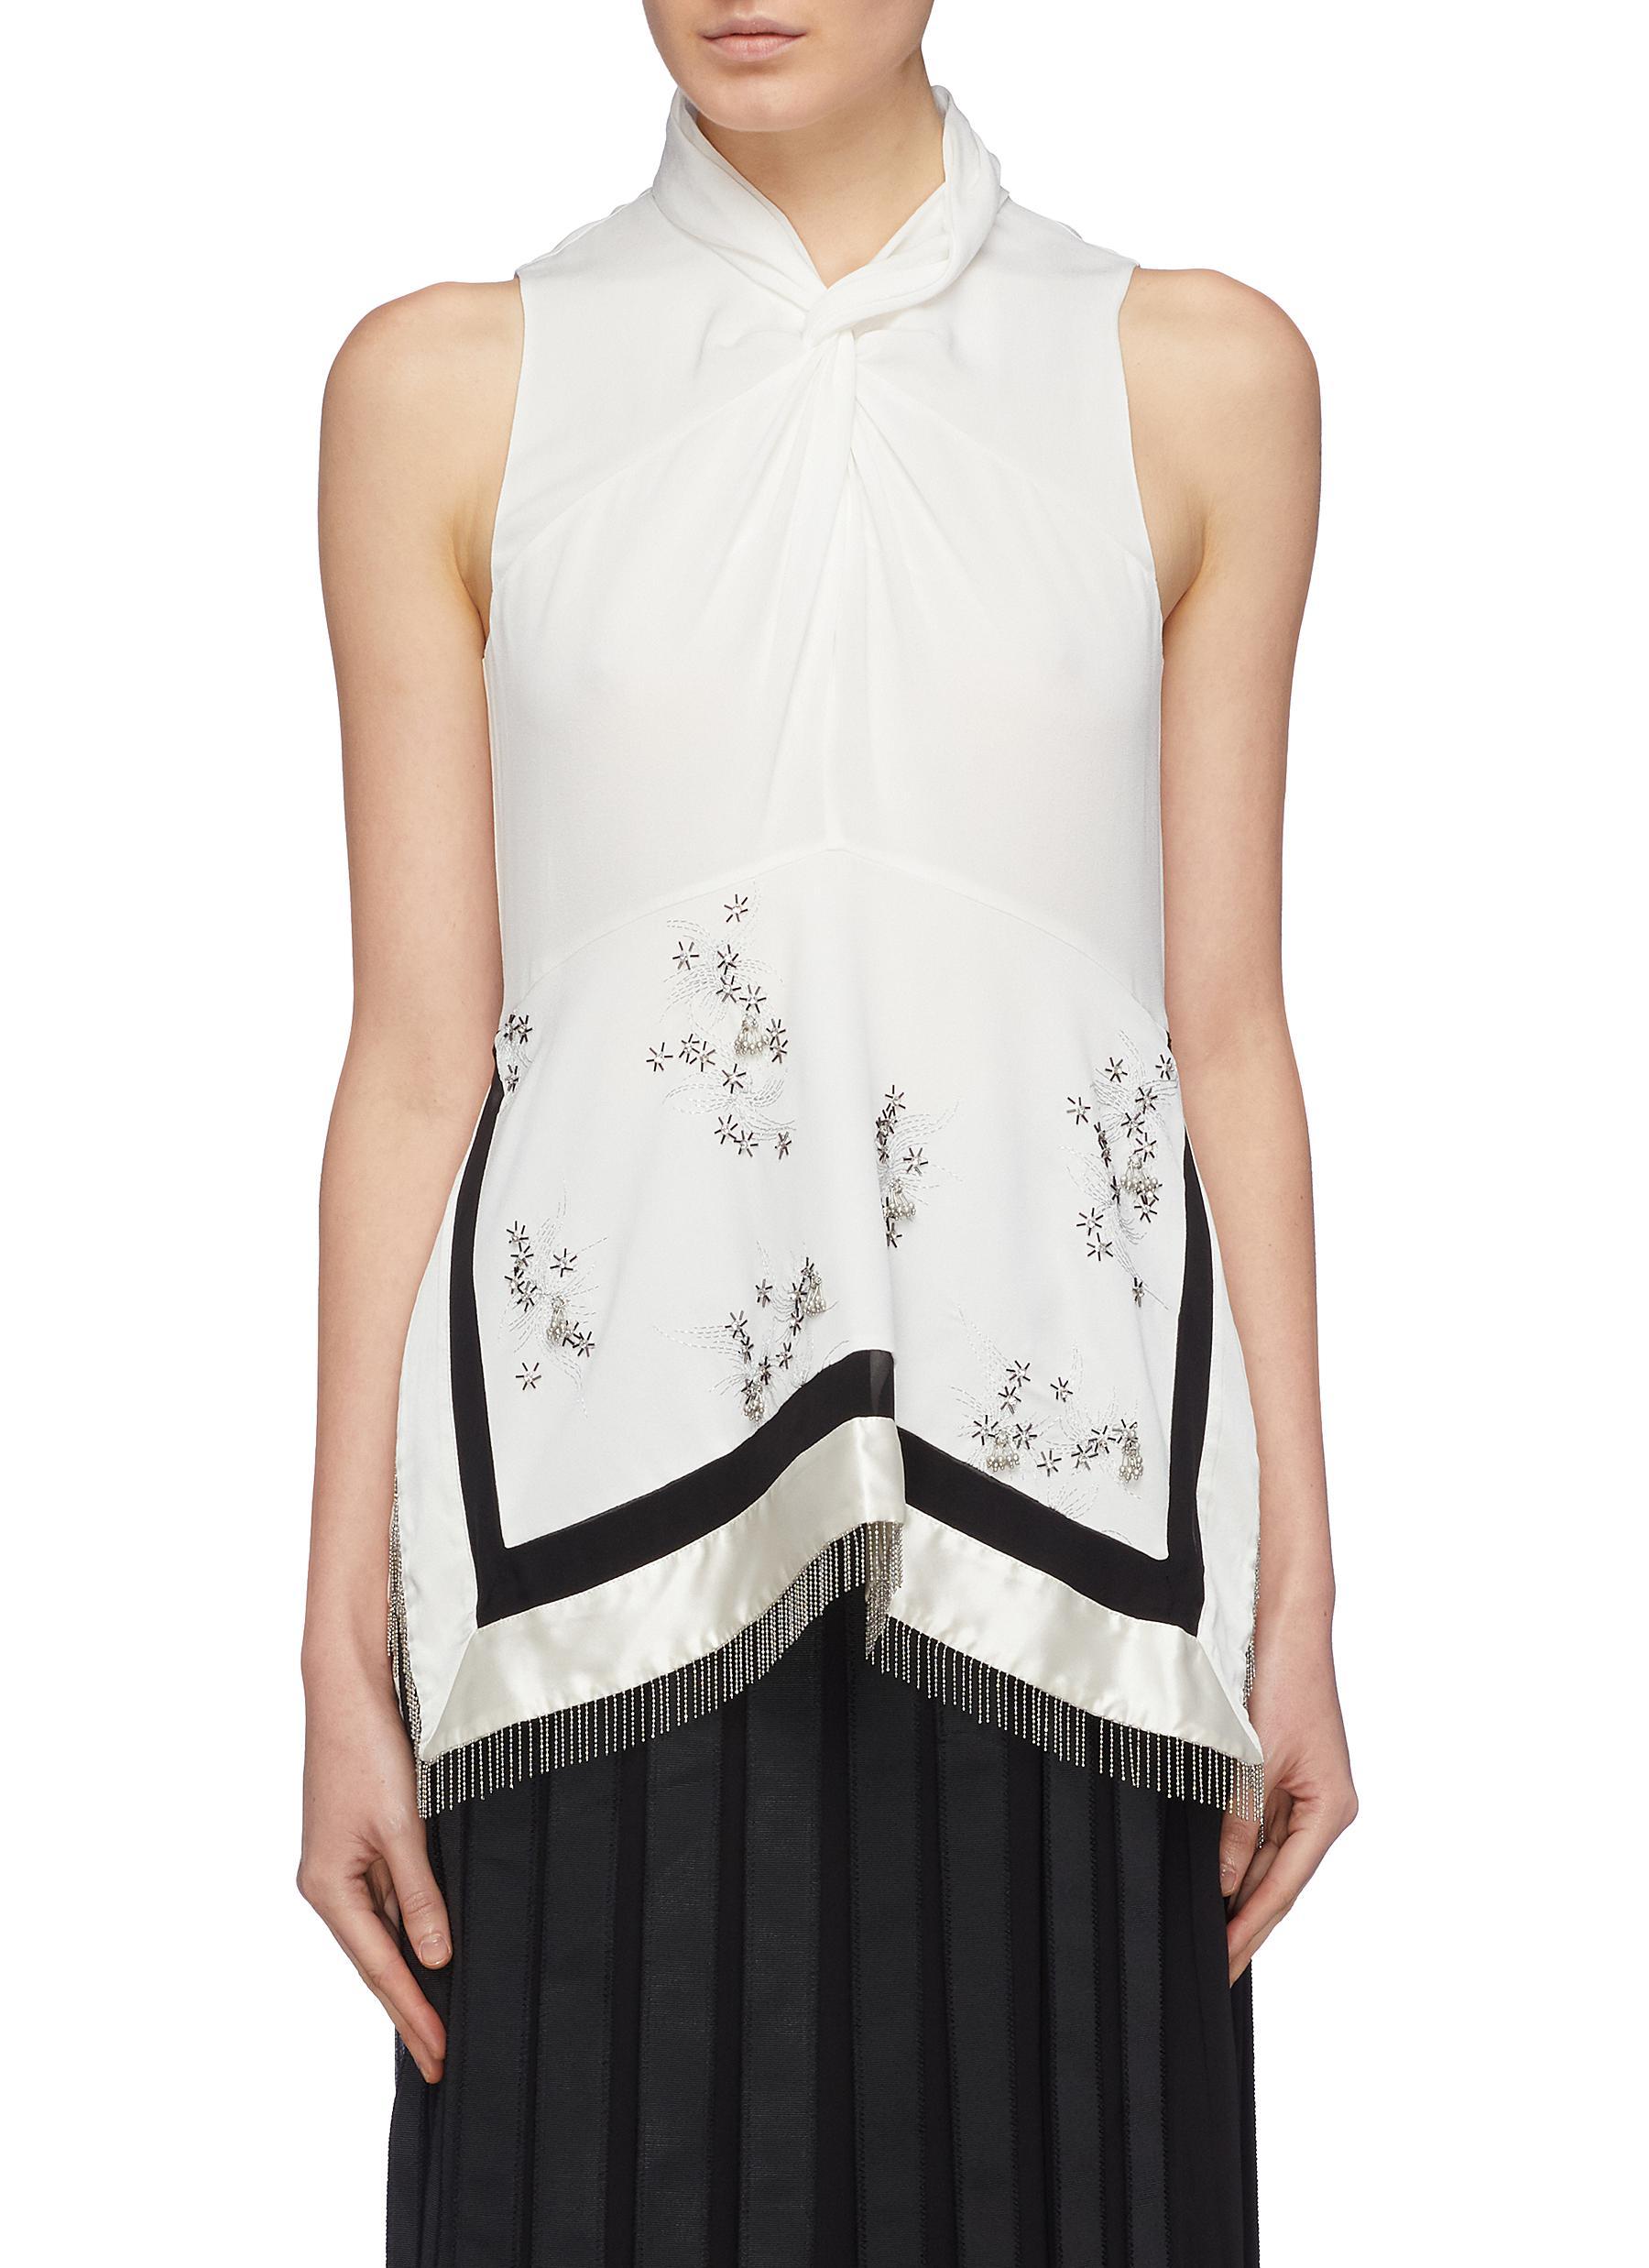 Twist neck beaded fringe handkerchief panel sleeveless top - 3.1 PHILLIP LIM - Modalova